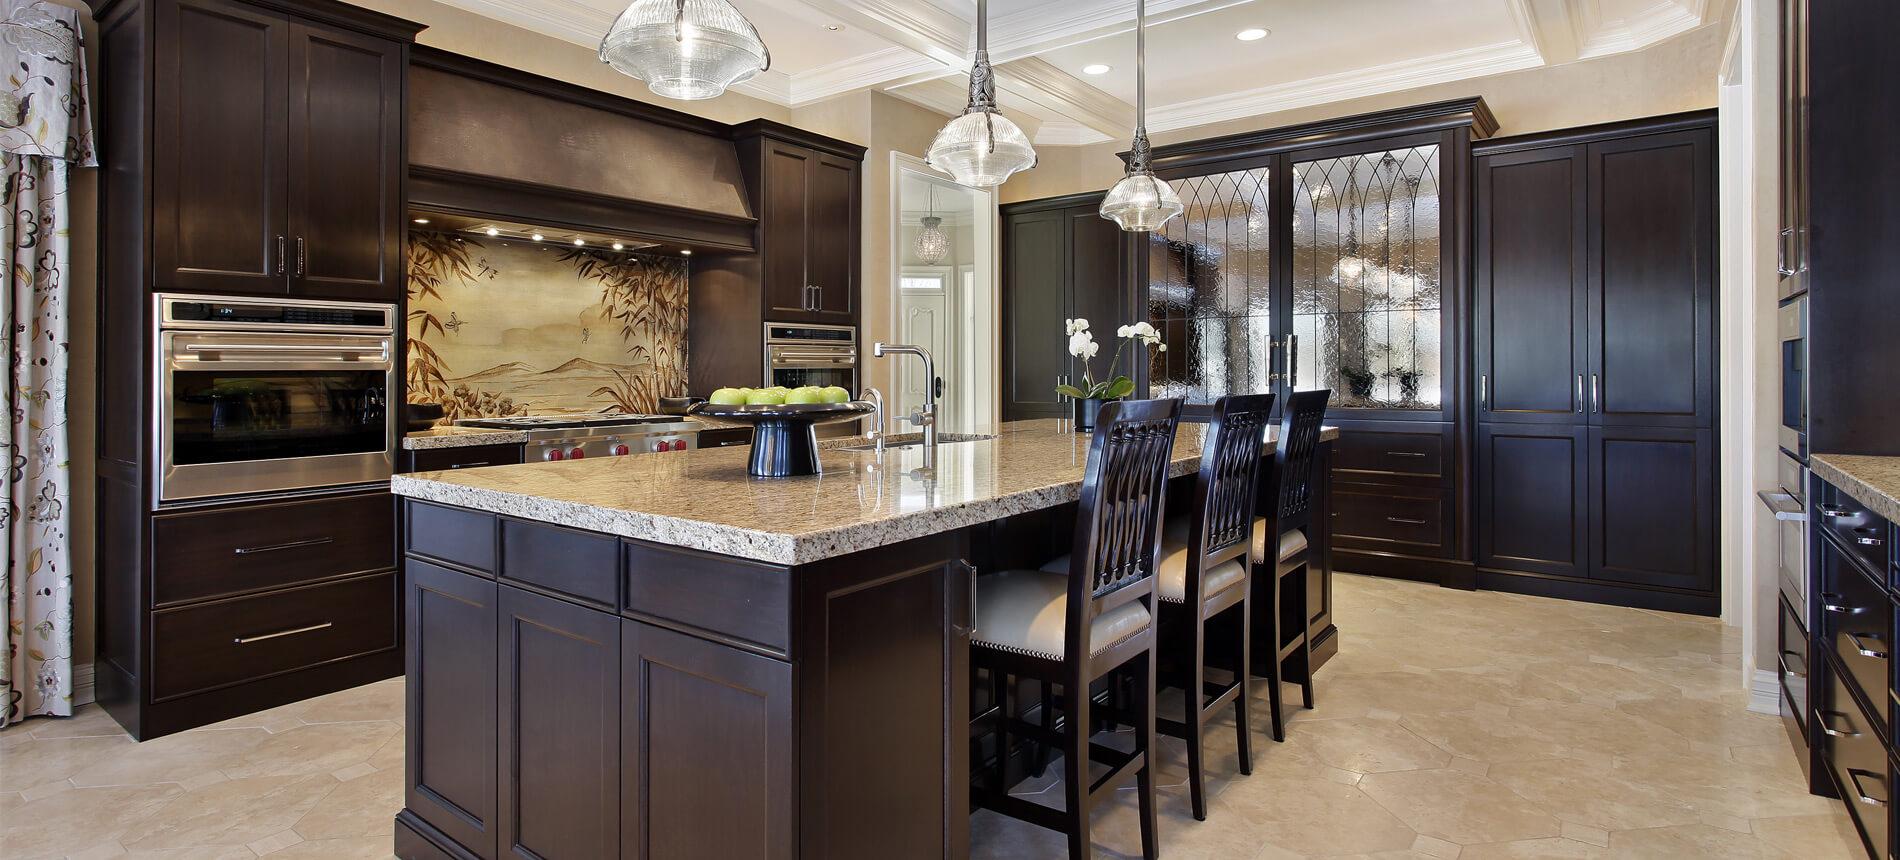 Kitchen Remodeling SmartFix Home Improvement - Bathroom showroom tampa